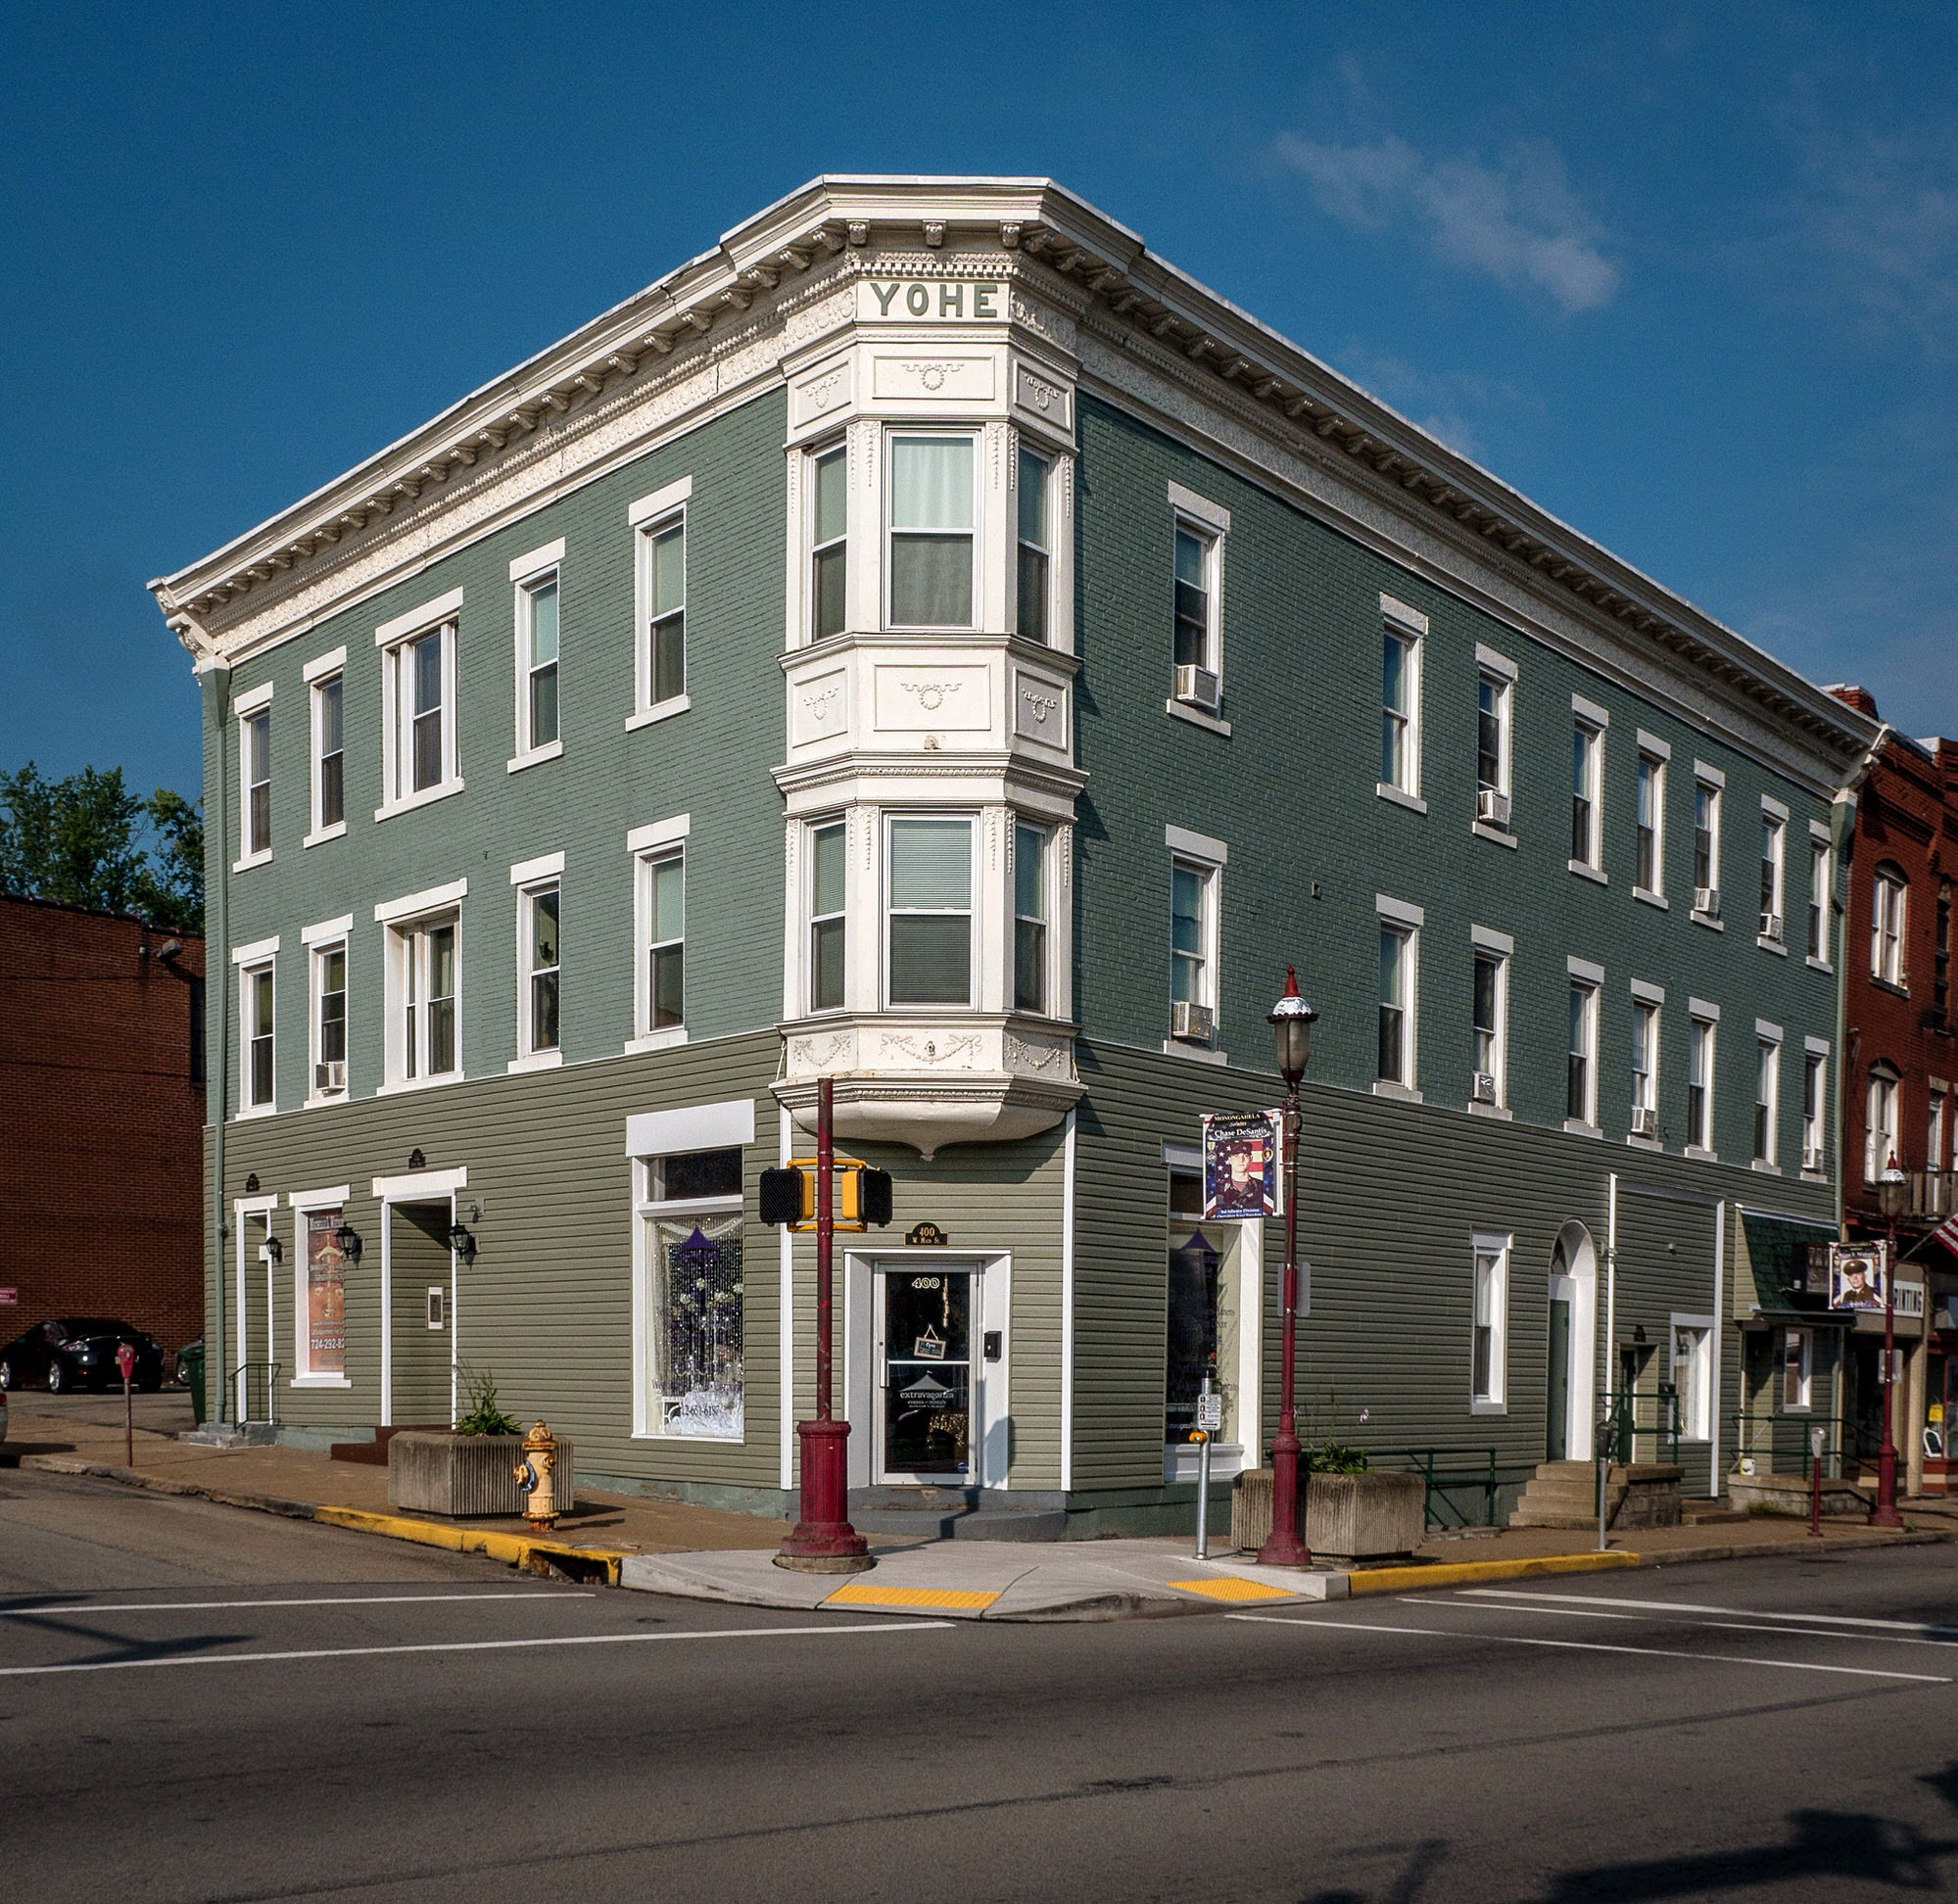 Photo of building at 400 - 408 West Main Street, Monongahela, Pa. 15063 along rt 88 and rt 136. Photo property of the Monongahela Main Street Program.